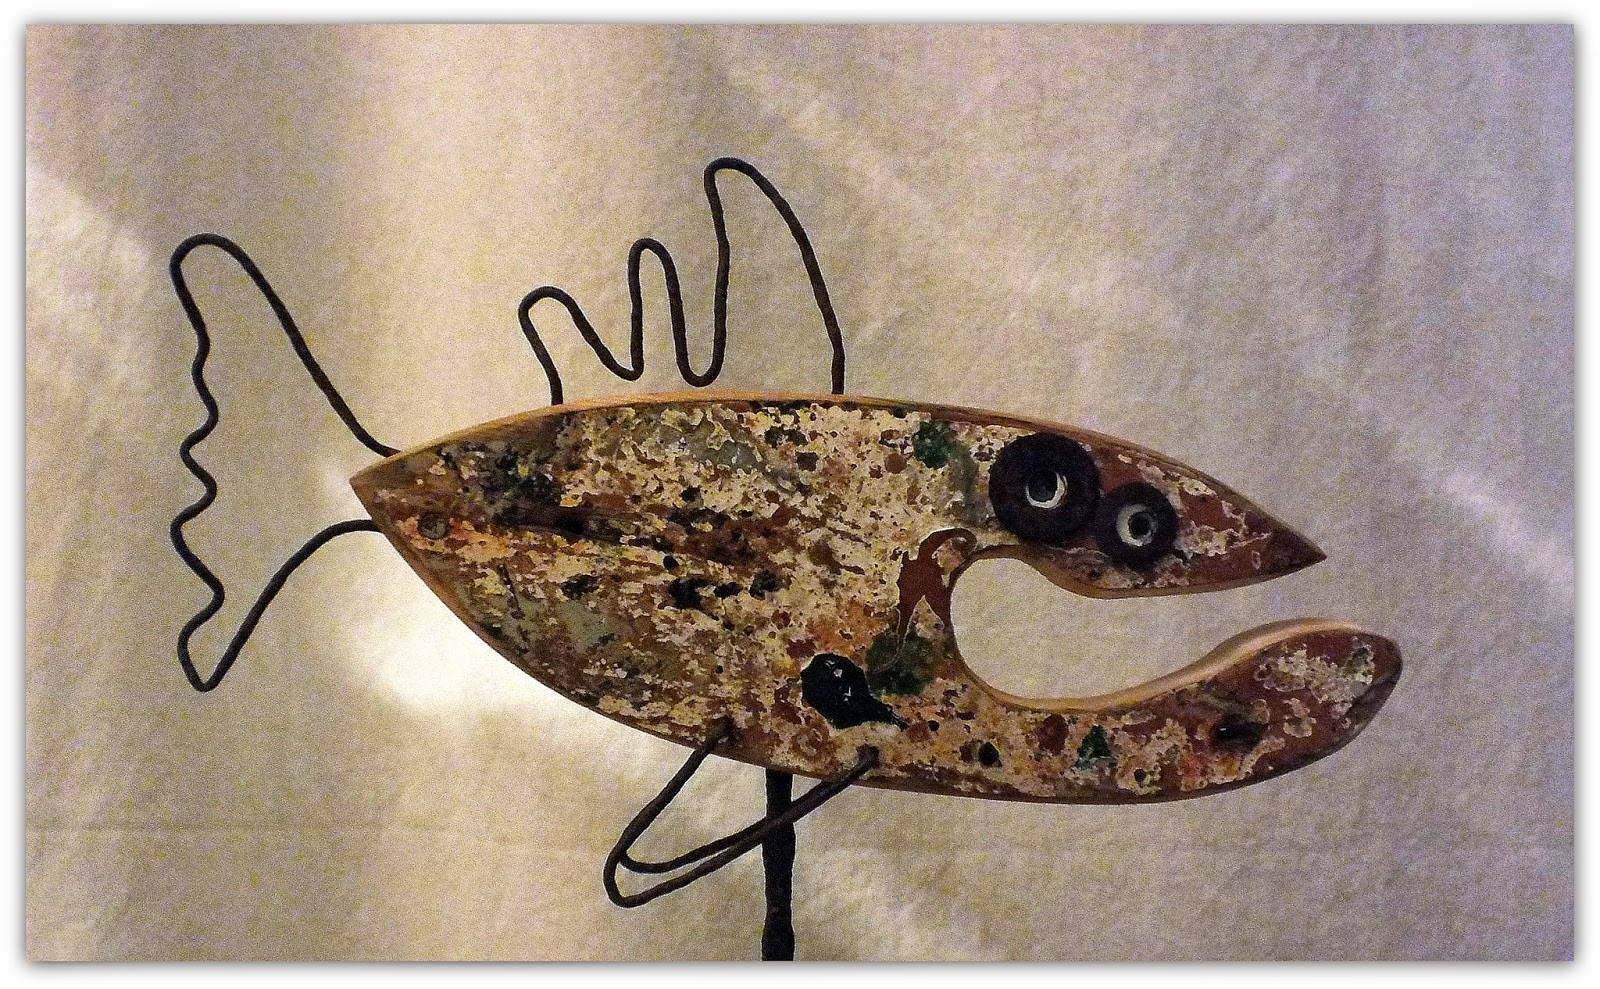 O\'Fishl, poisson en bois flotté et métal, réversible ! | Mutoz inc ...